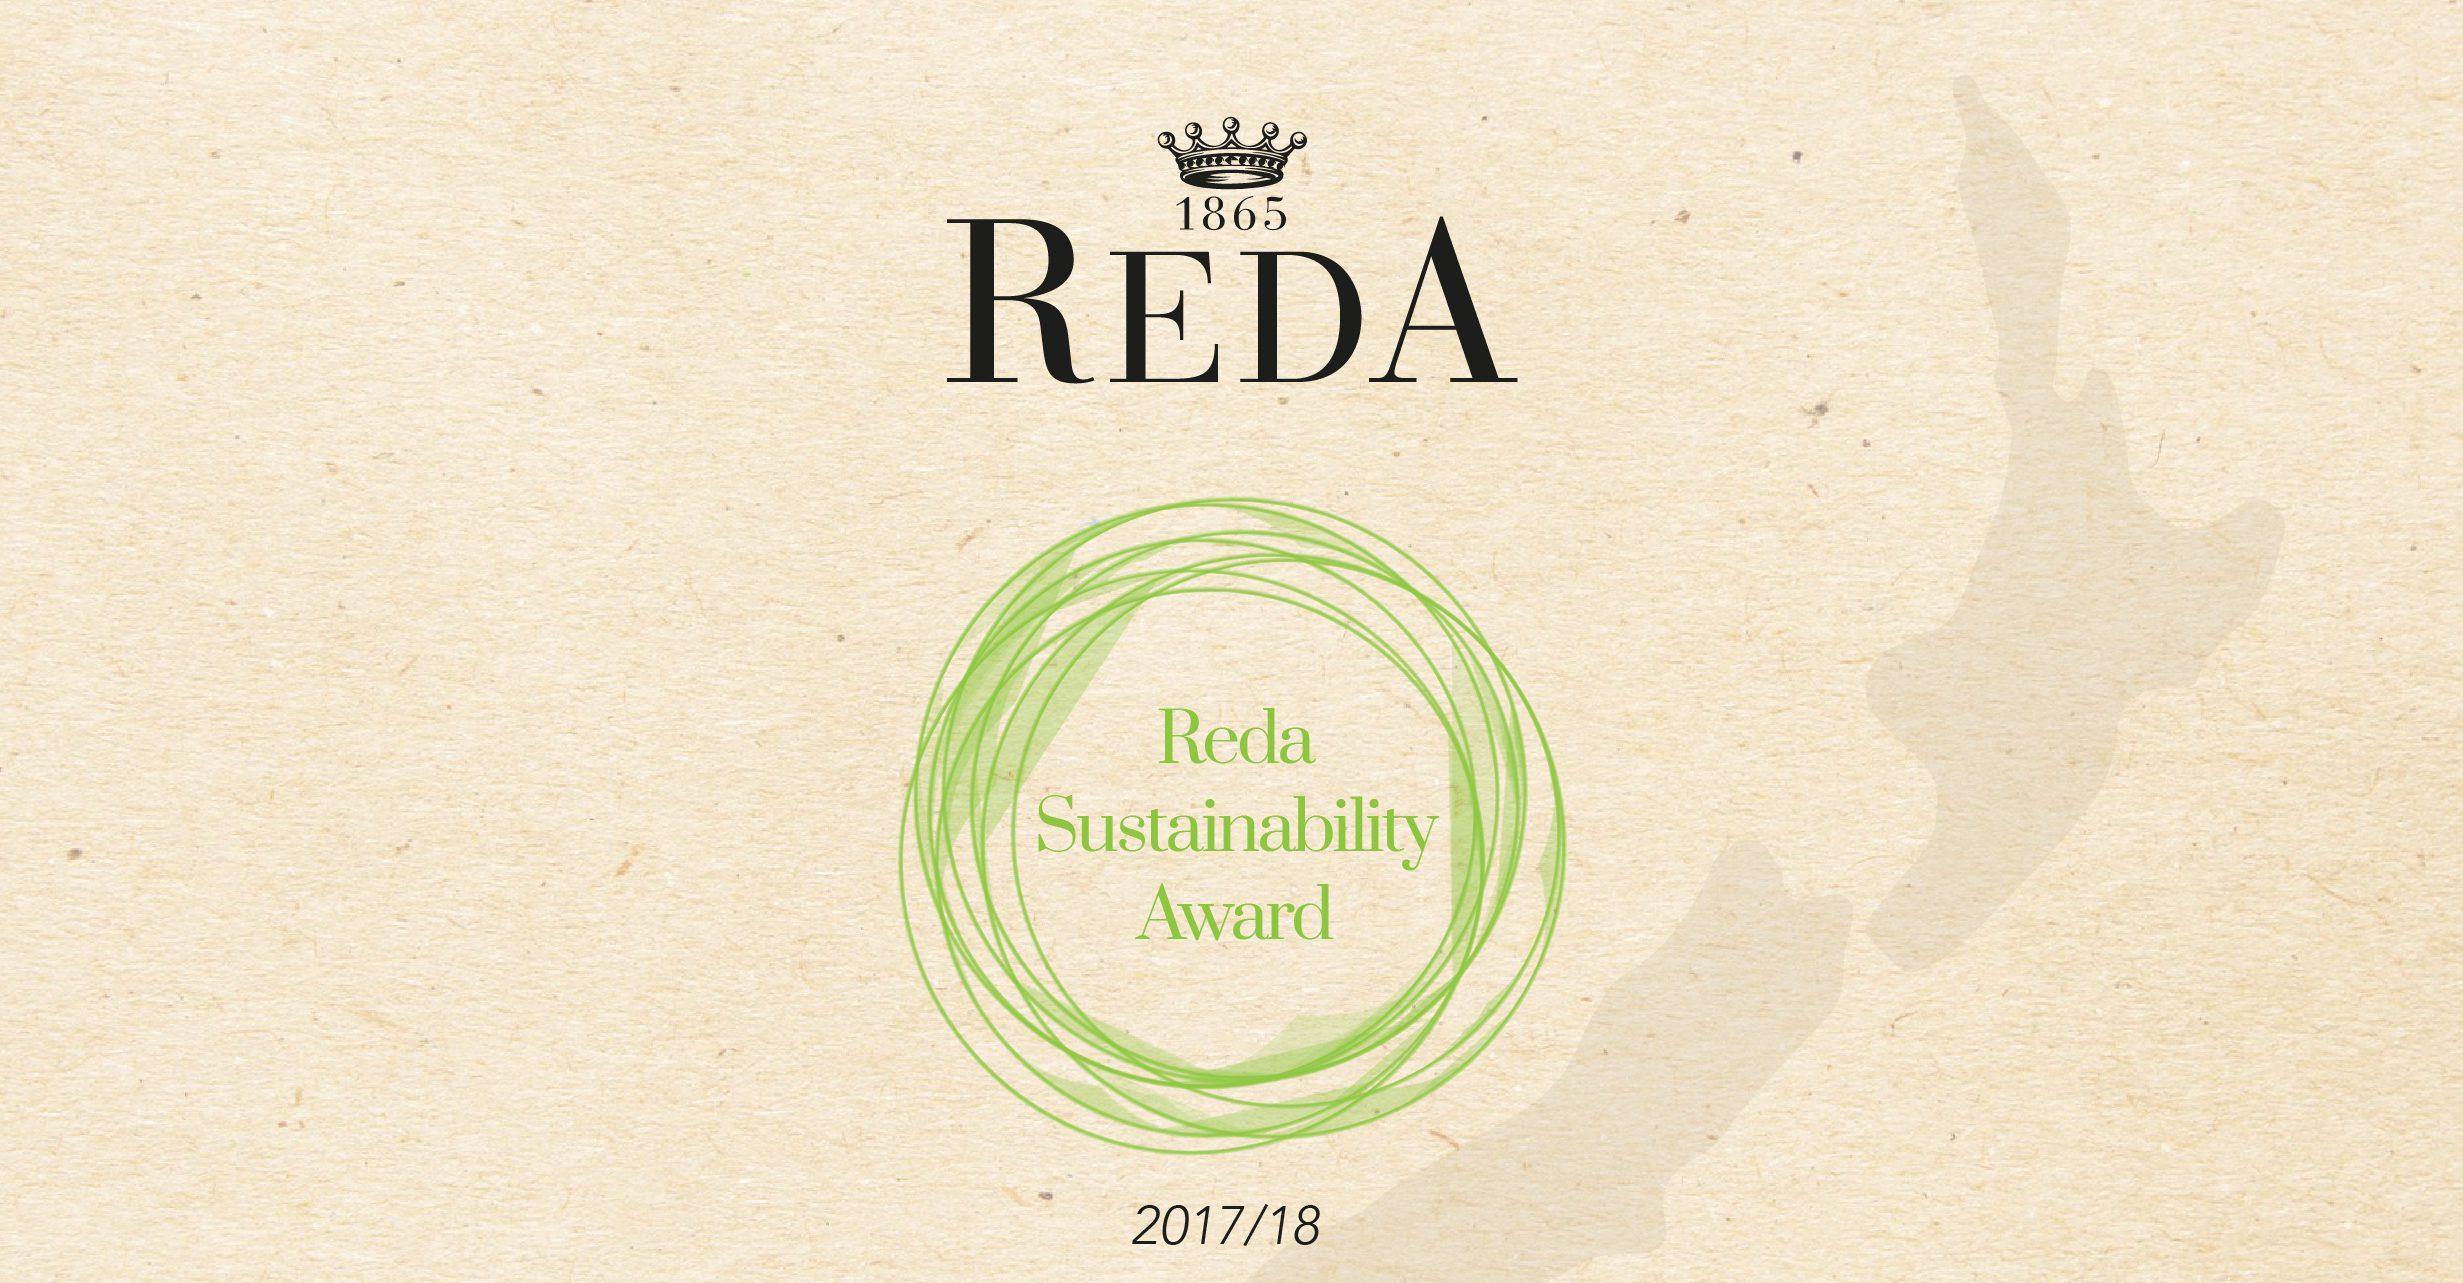 Reda Award